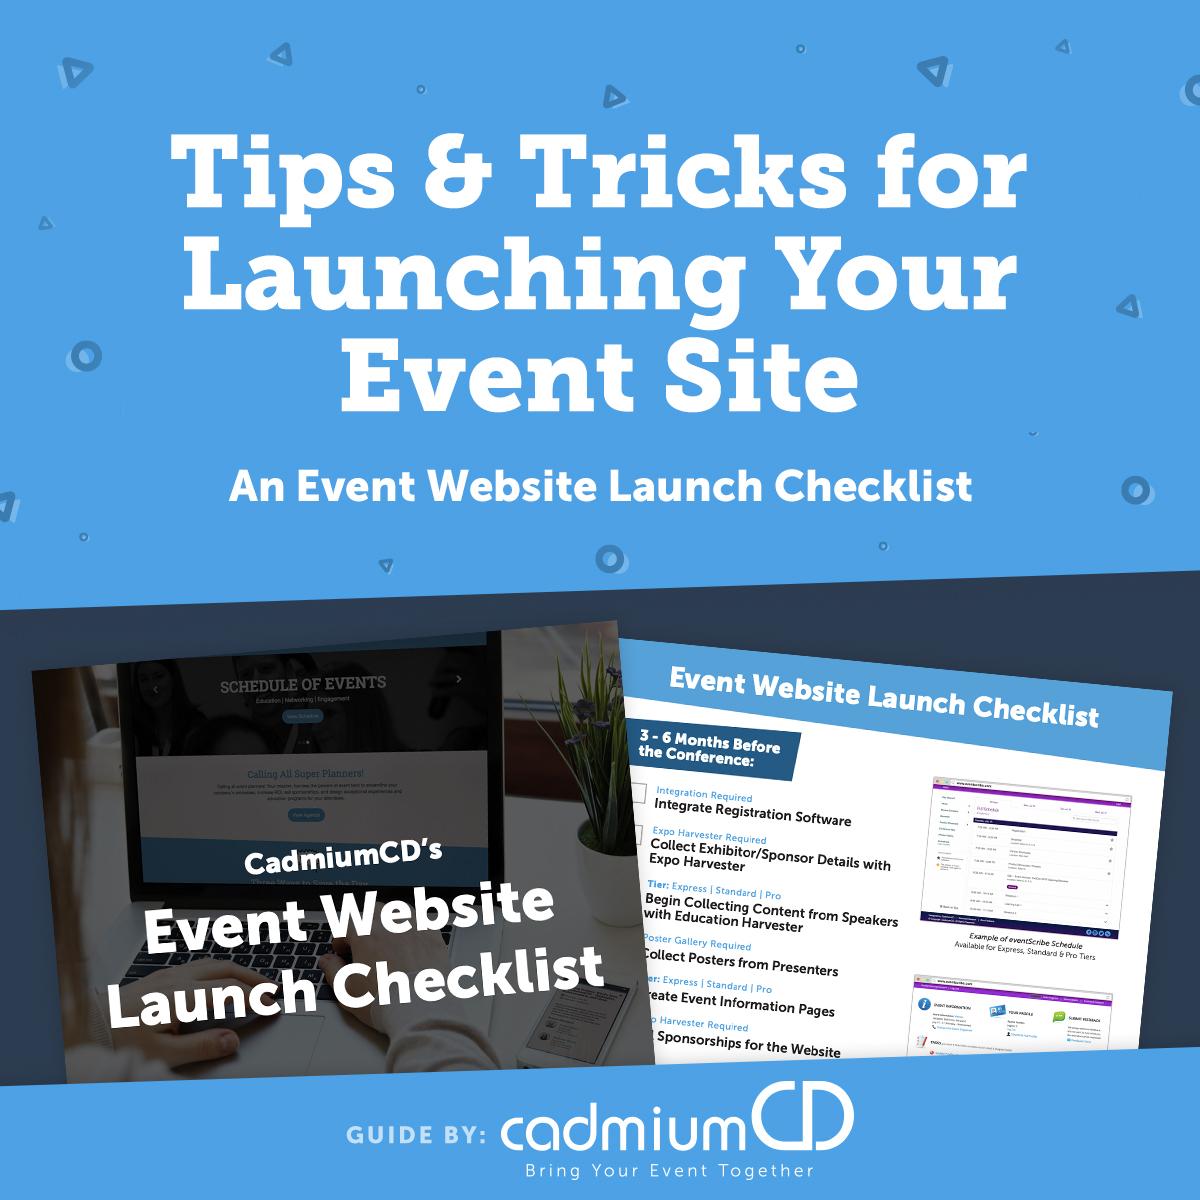 Event Website Launch Checklist